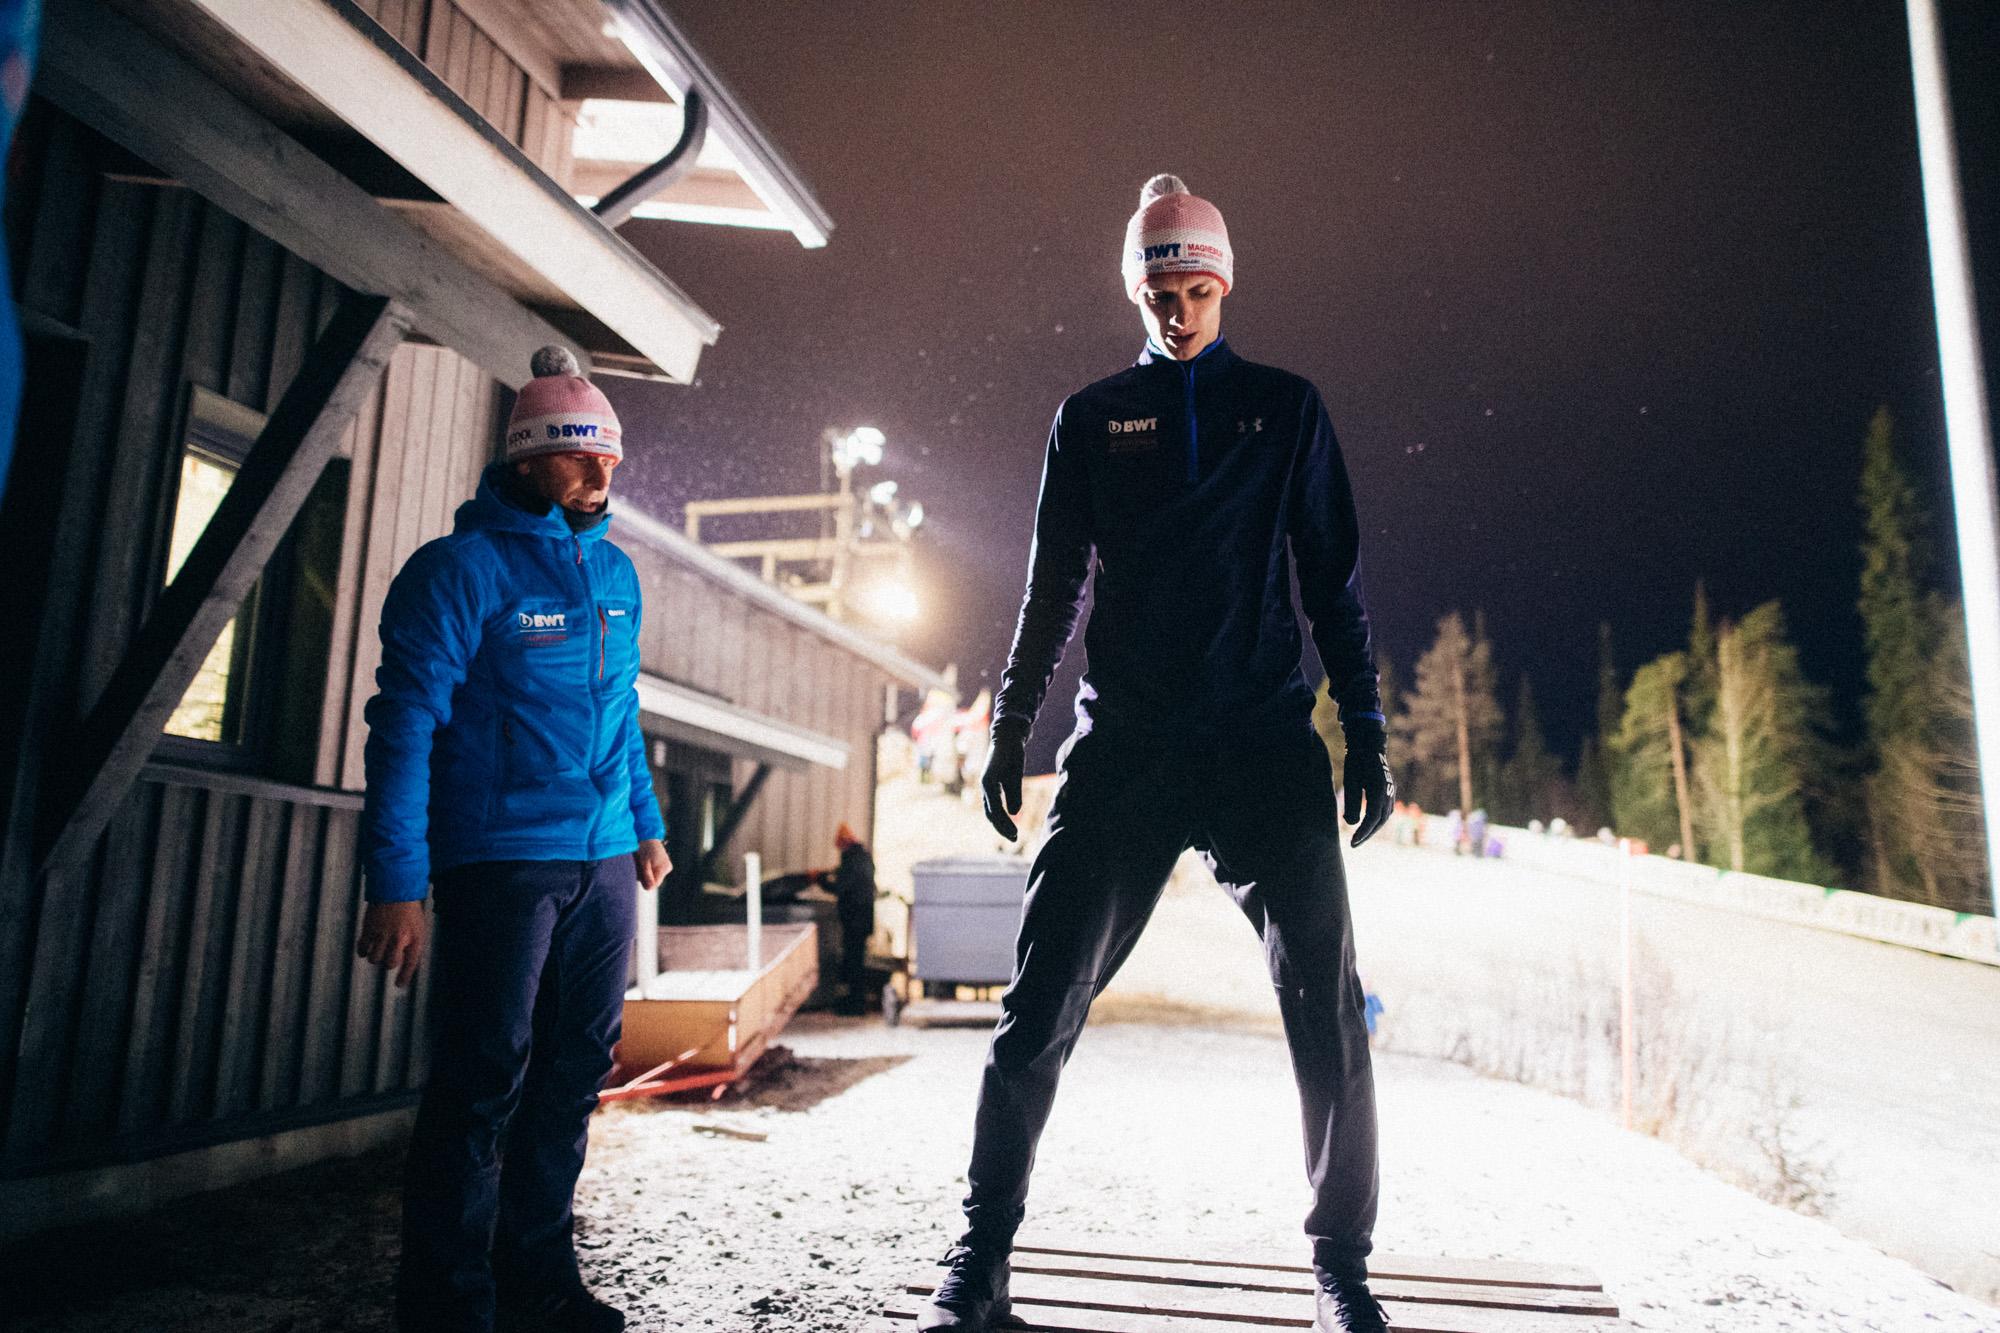 greta-horsch_bwt_ski-jumping_max-threlfall_2